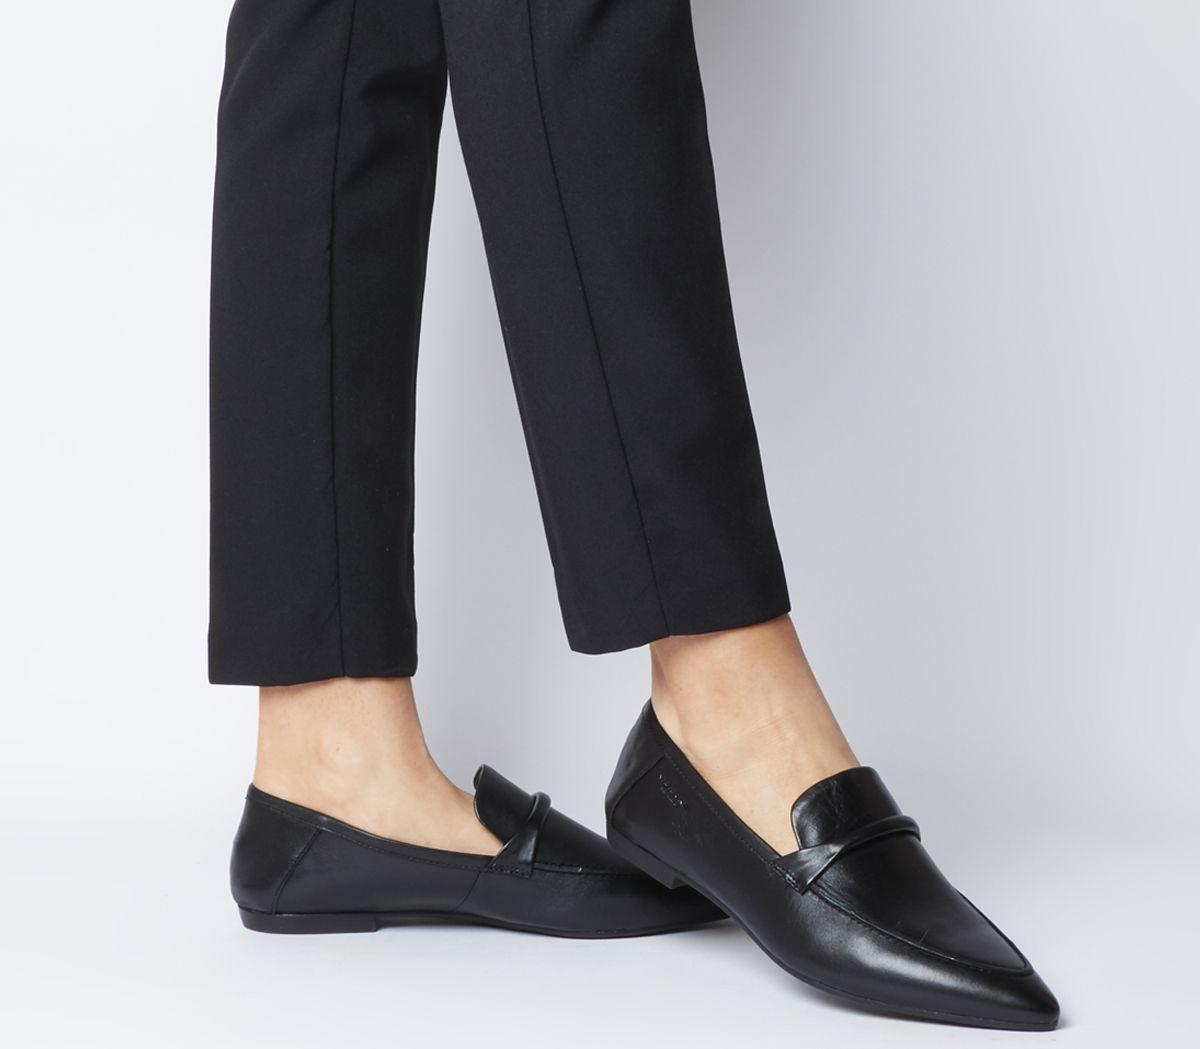 6a487f88e6f Vagabond Katlin Loafers Black Leather - Flats